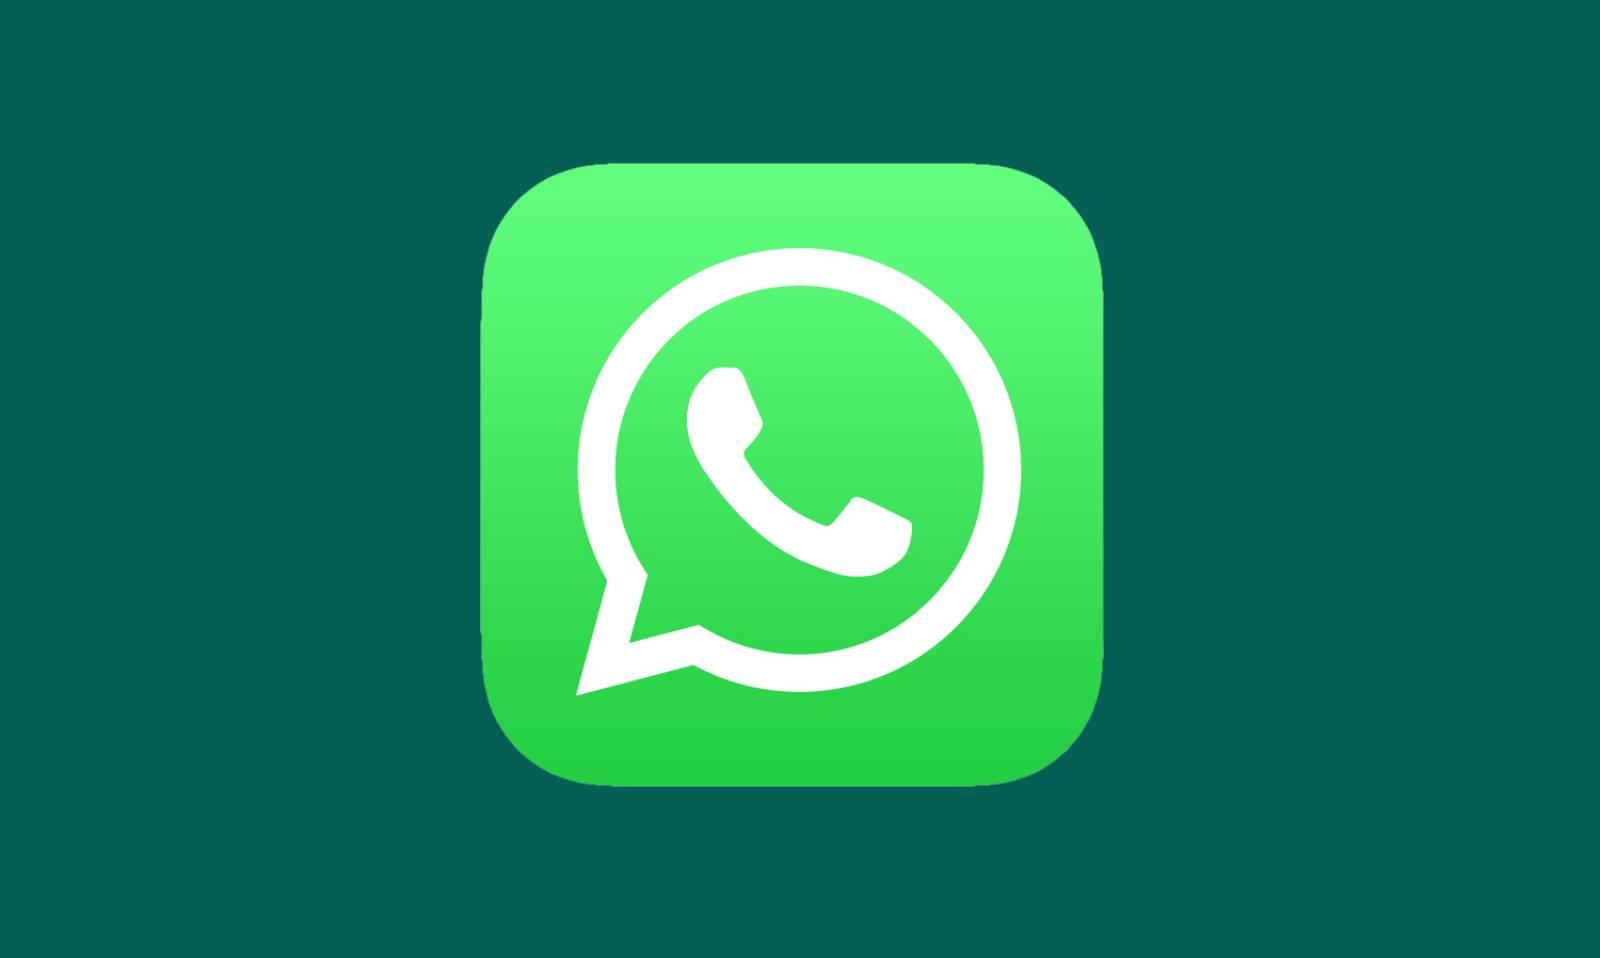 WhatsApp citite